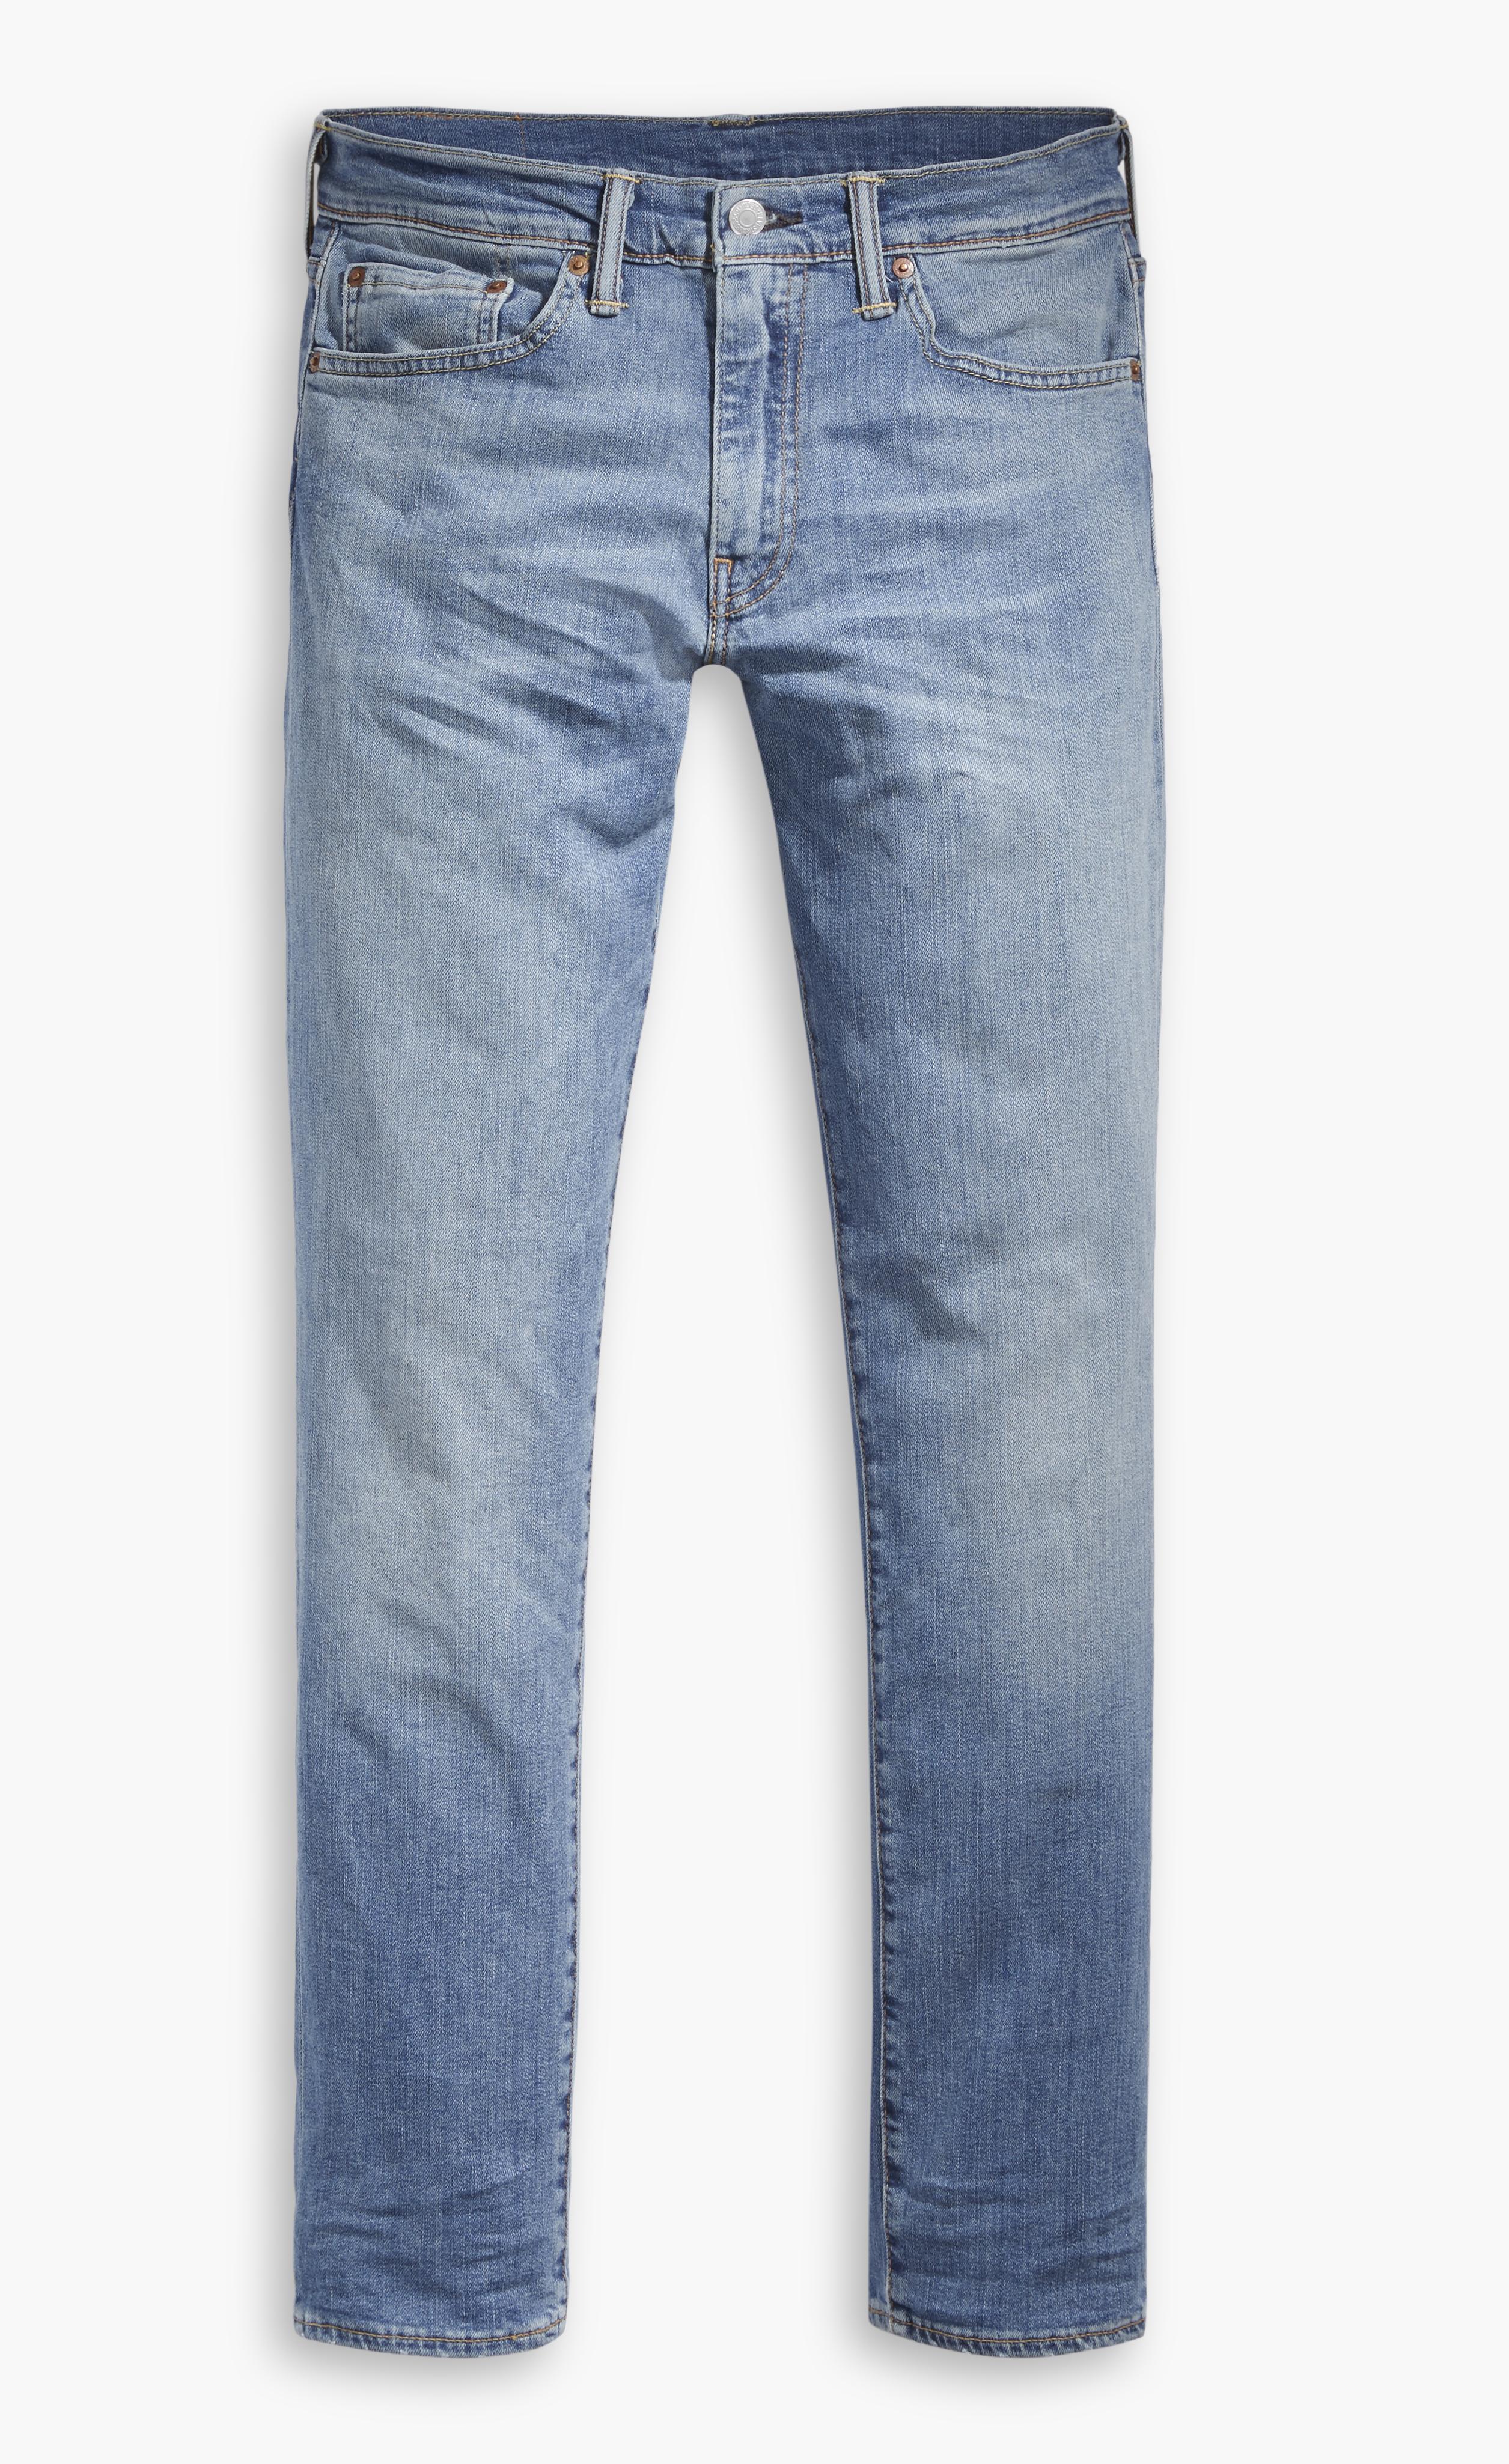 LEVIS Jeanshose Jeans 04511-2153 511 SLIM FIT SUNFADE W18-LJJ1